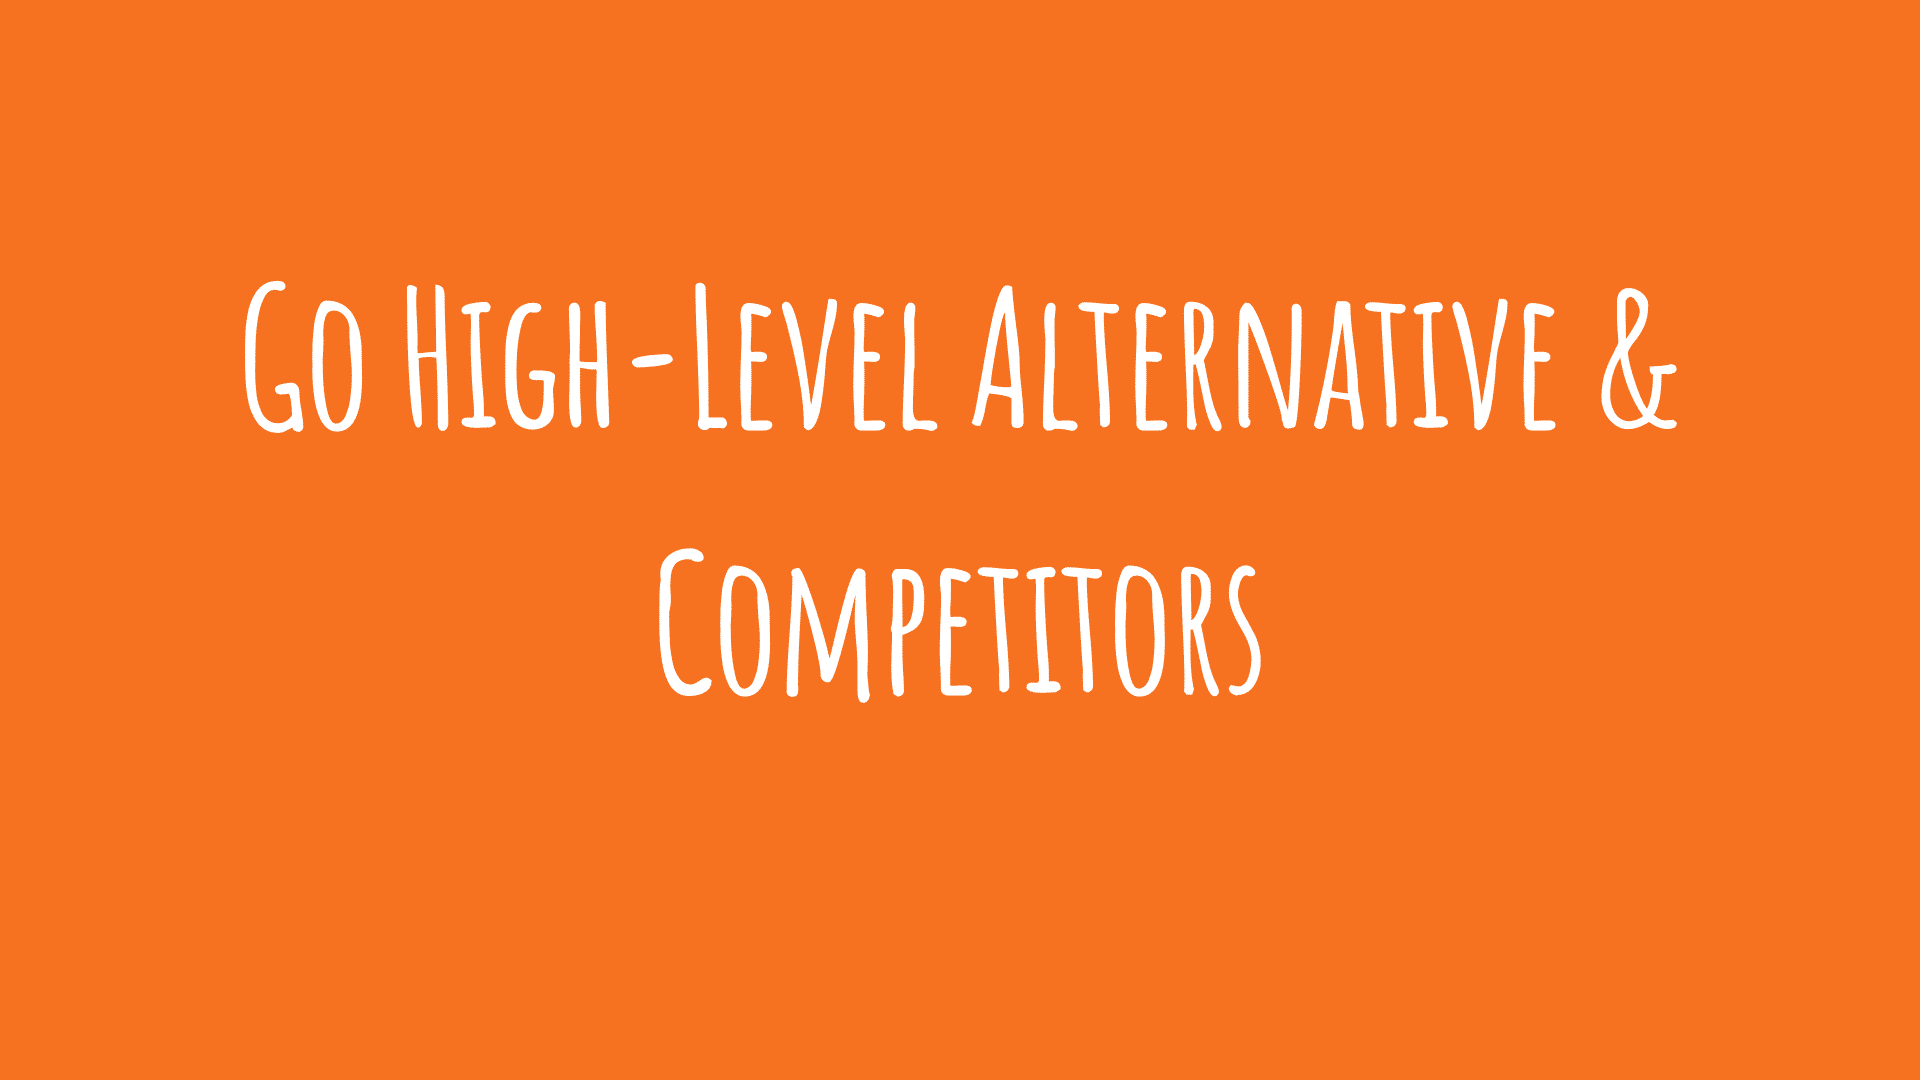 Go High-Level Alternative & Competitors